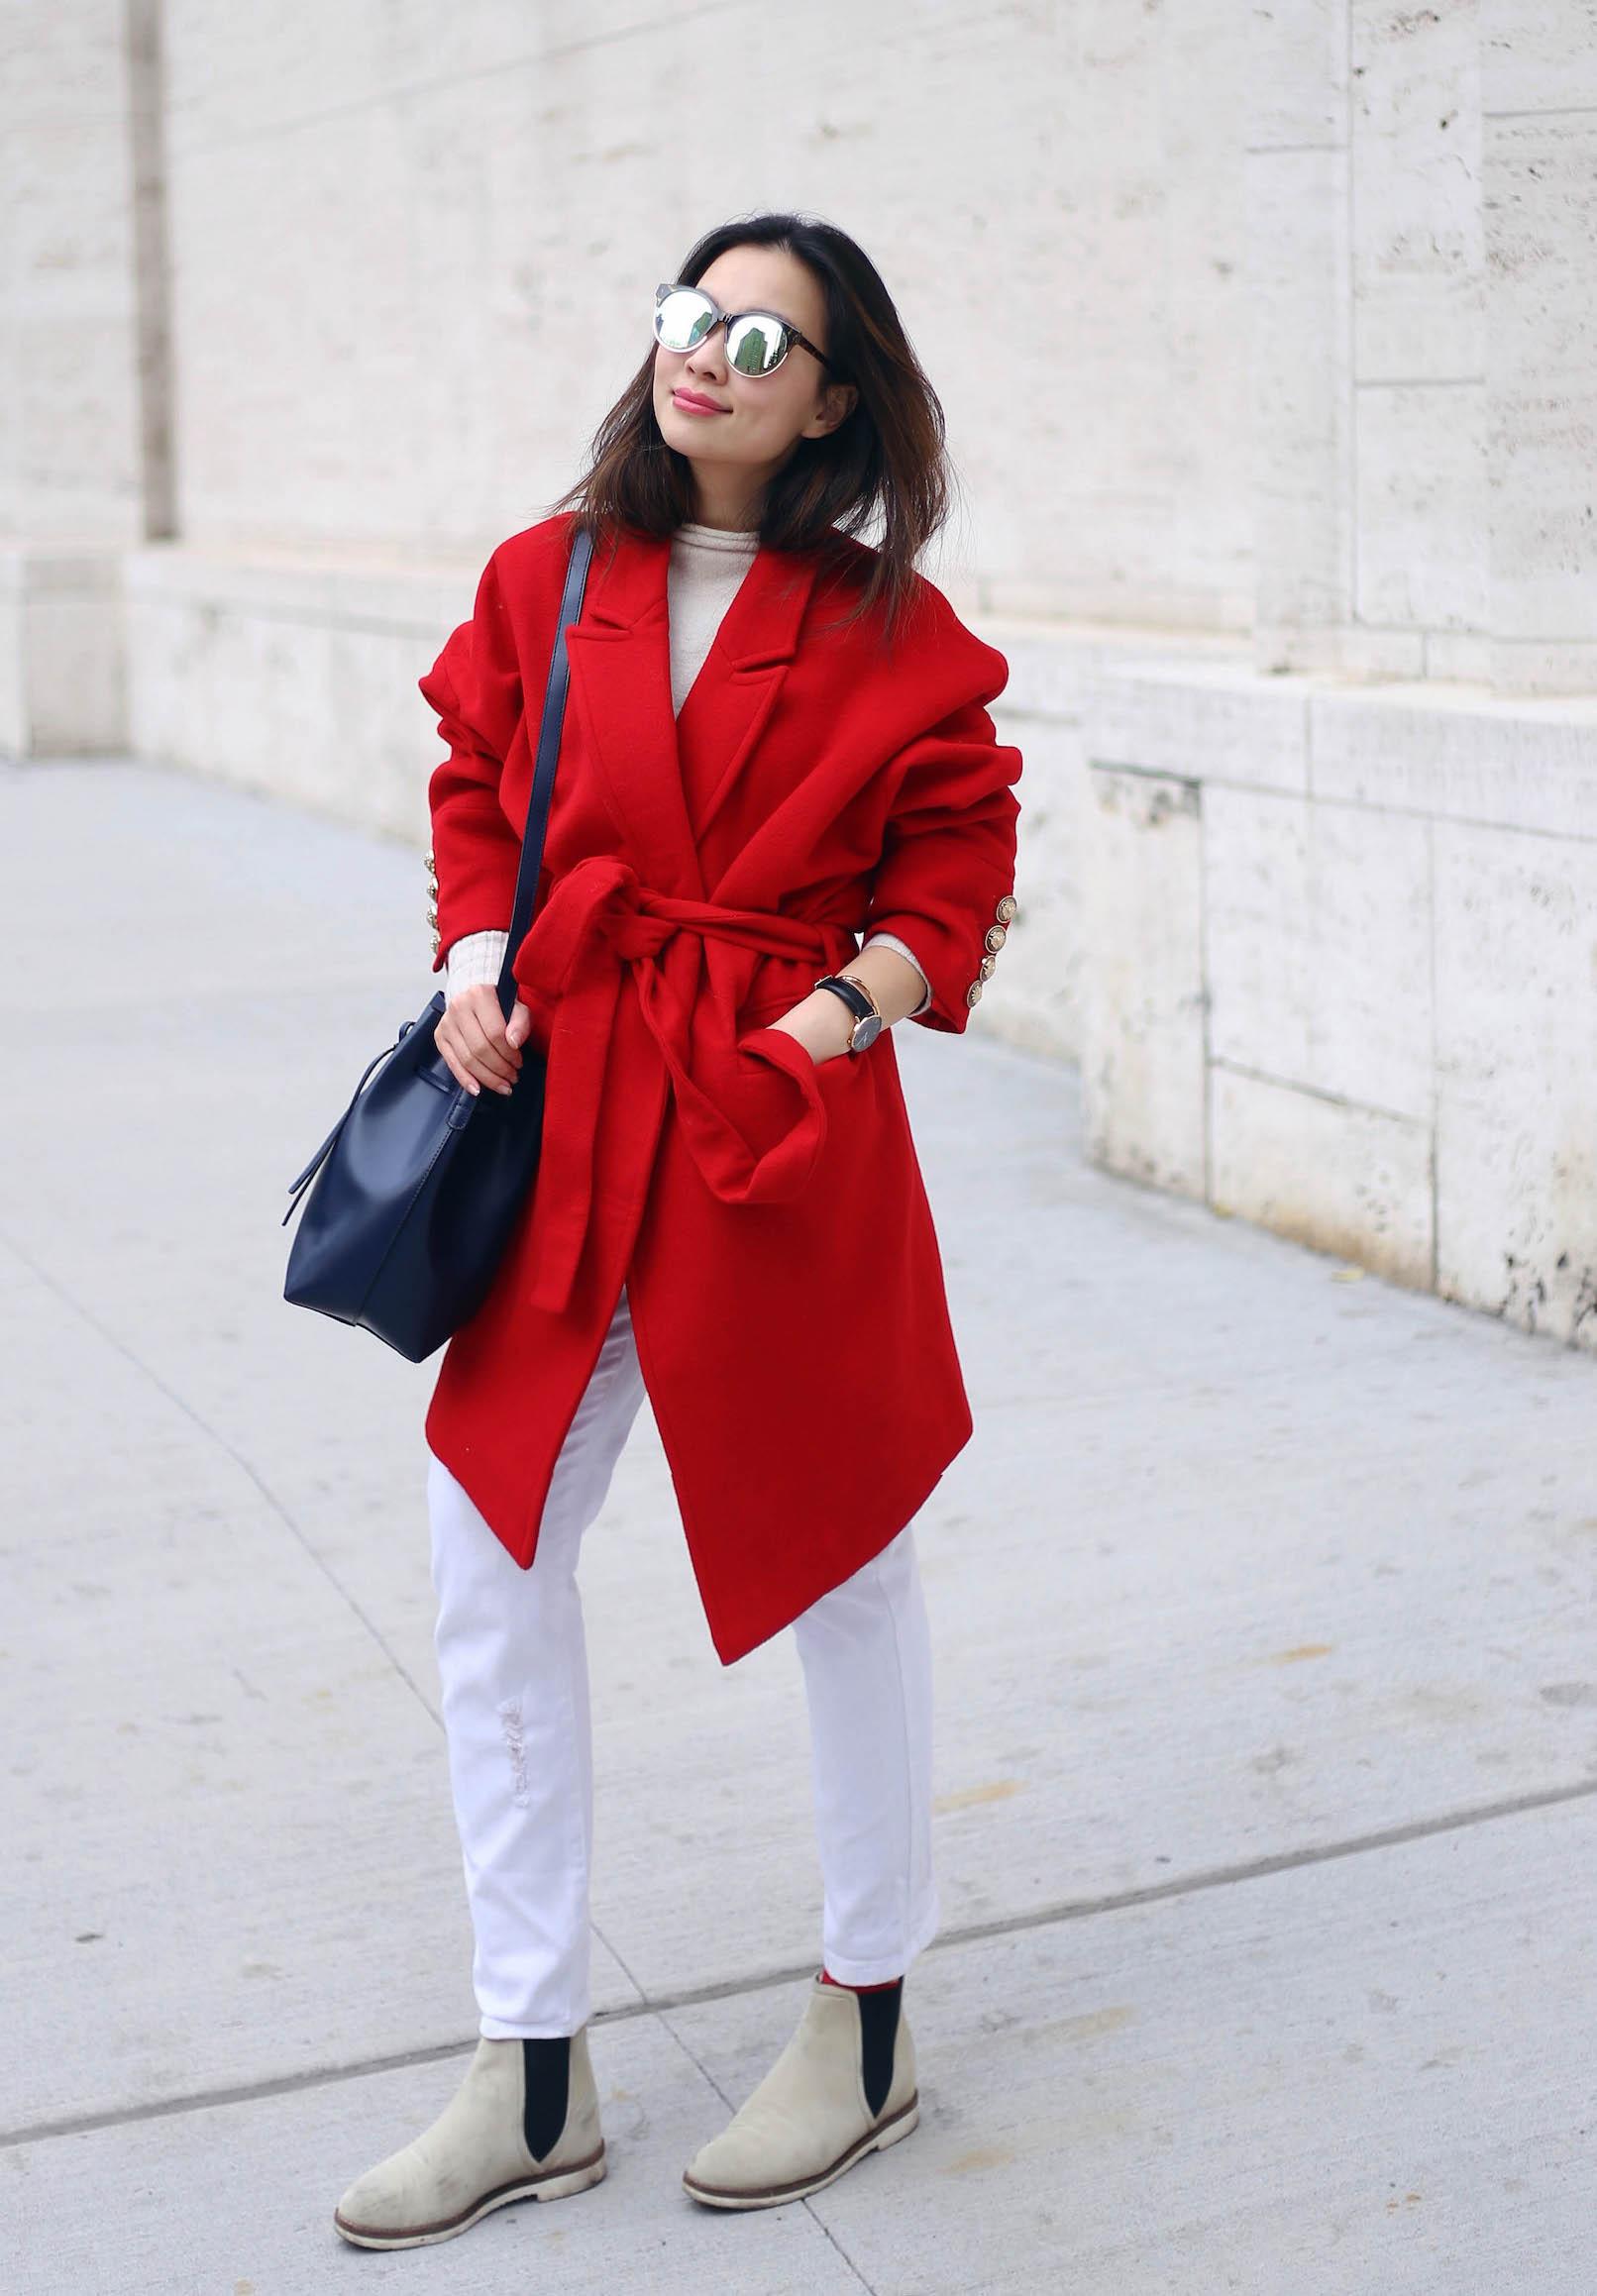 xmas outfit inspiration.JPG